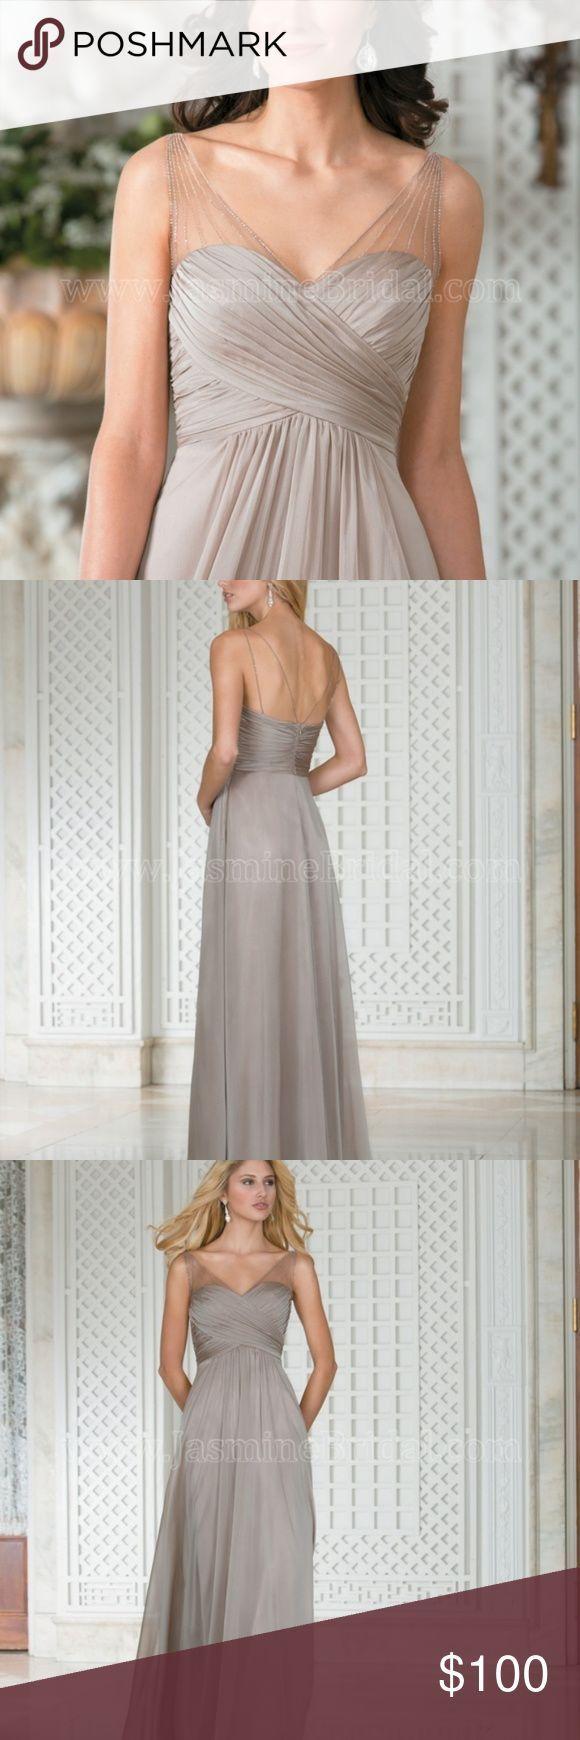 Belsoie Jasmine Tiffany Chiffon Dress – Vanilla An elegant Tiffany chiffon bridesmaid dress that can find a place at any wedding. This dress has a V-n